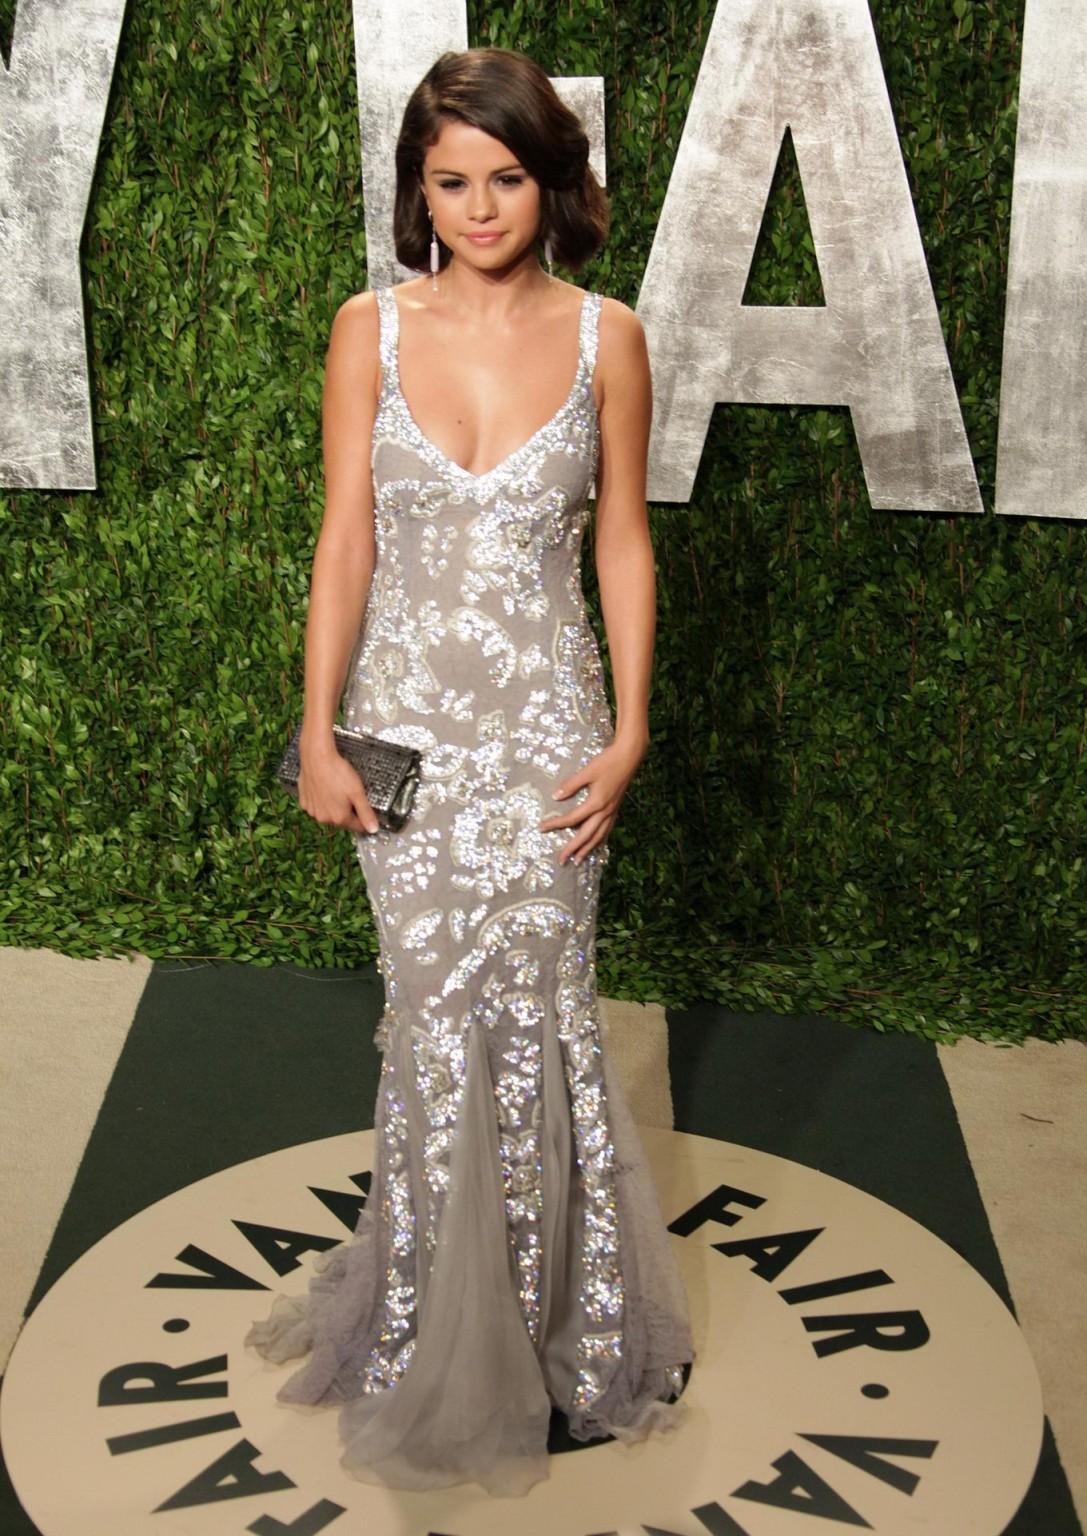 Selena Gomez - Галерея 3148530